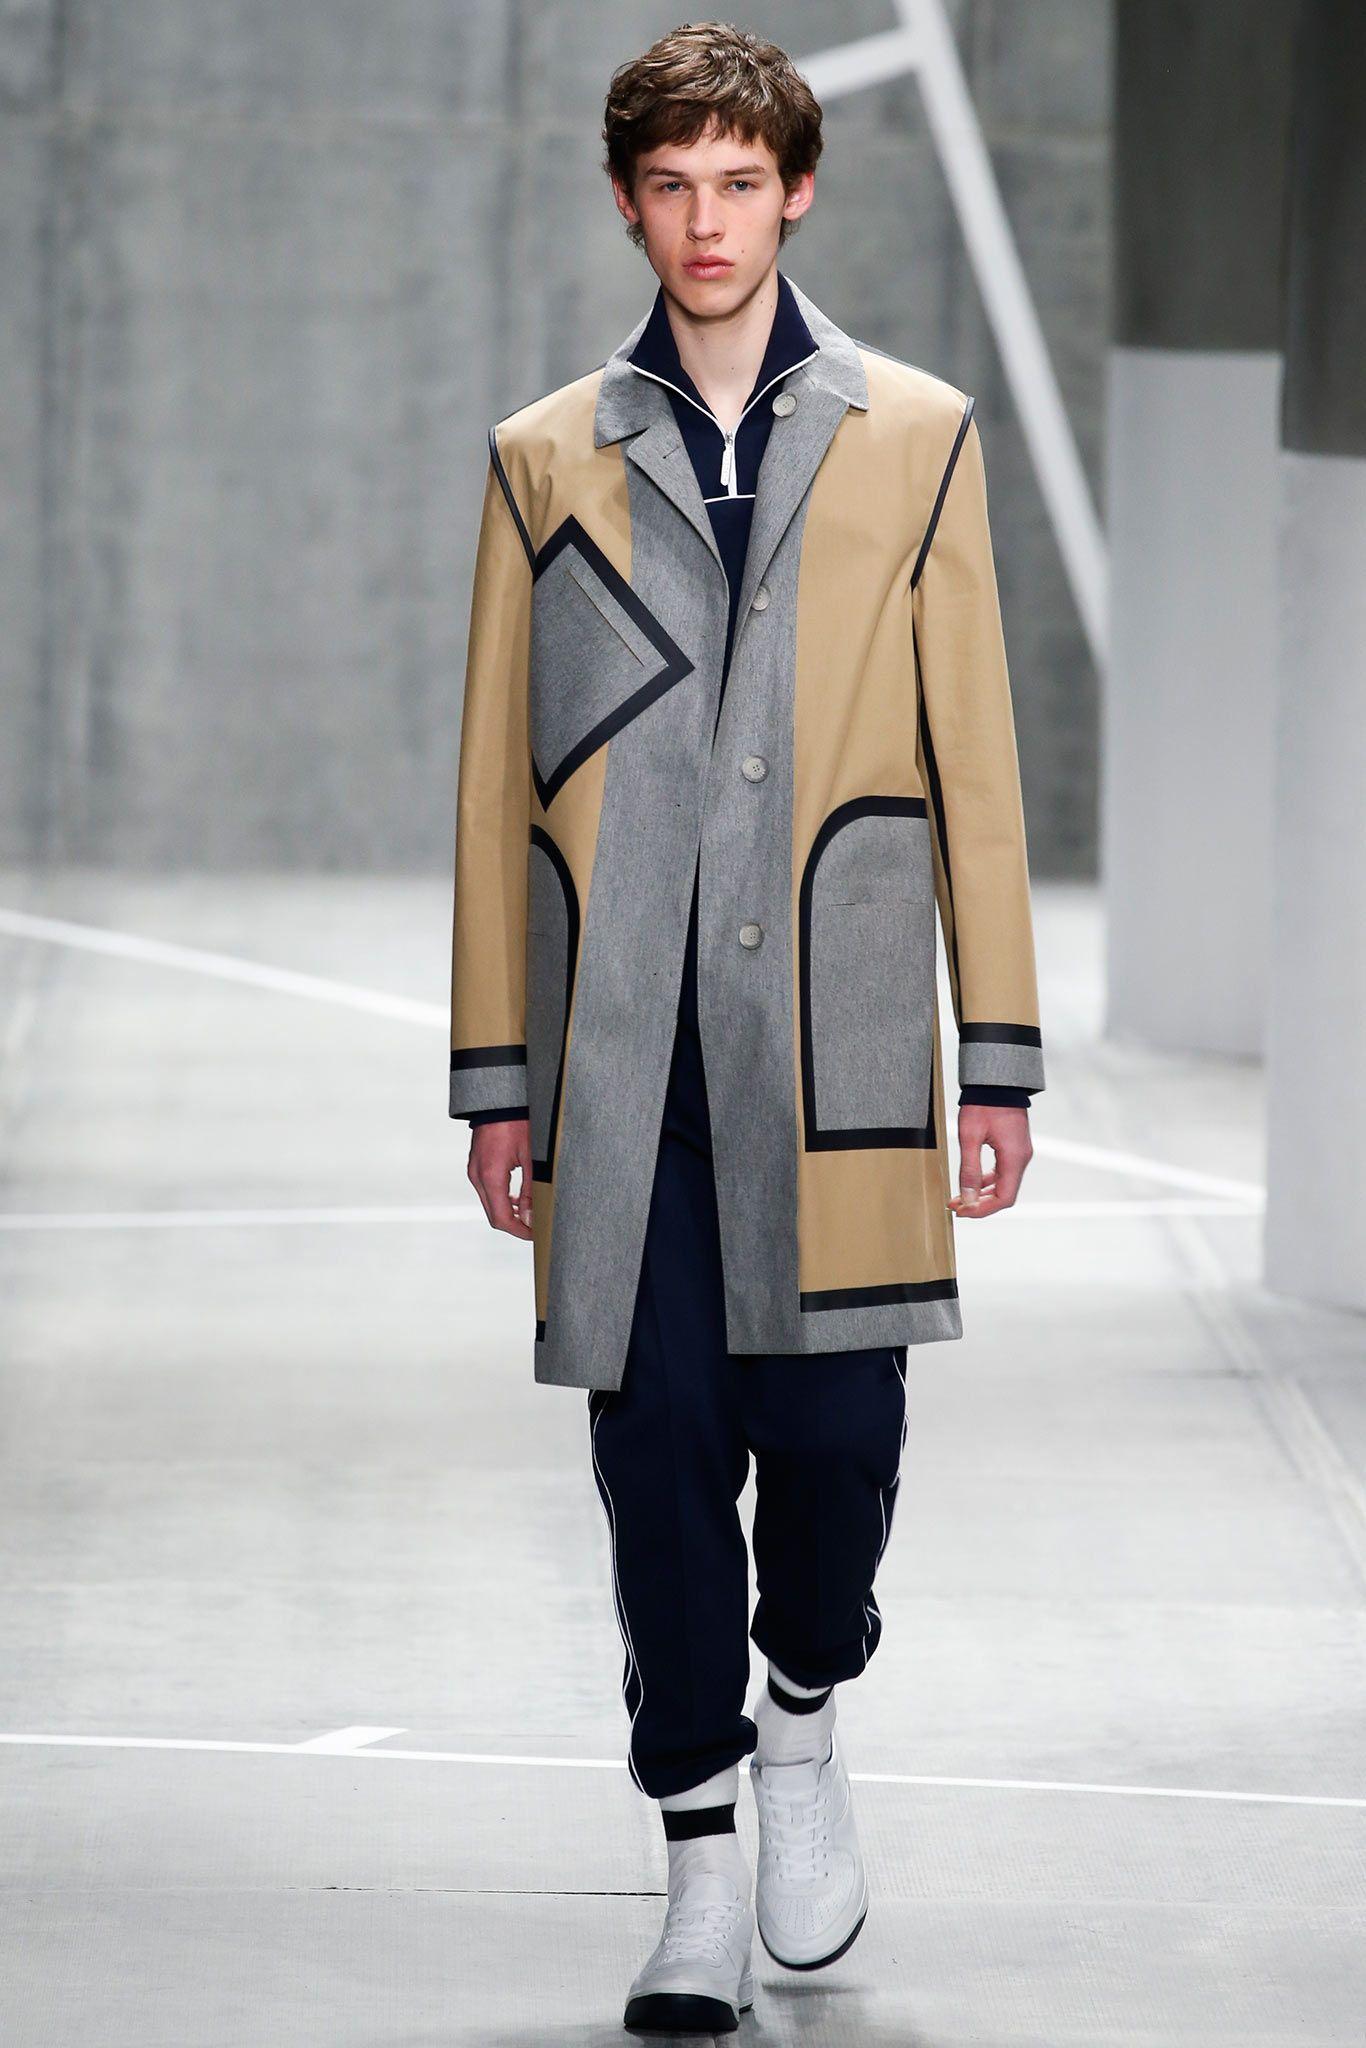 Lacoste - Fall 2015 Ready-to-Wear - Look 4 of 46